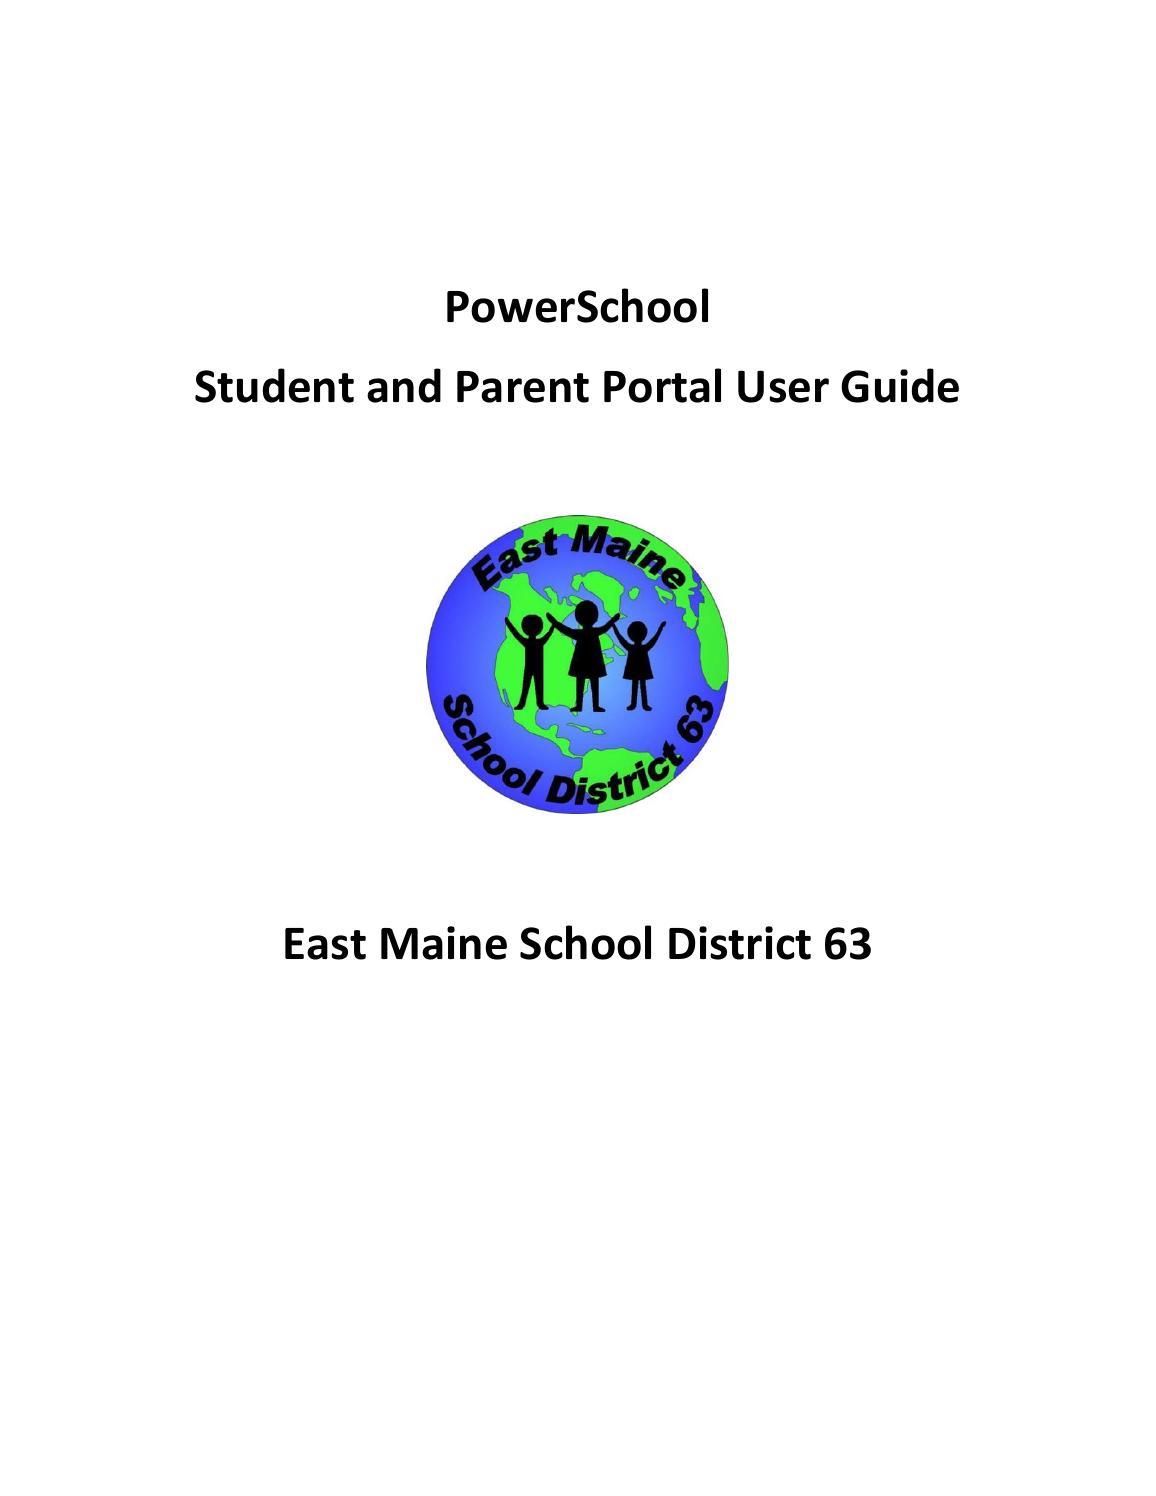 Powerschool Parent Portal User Guide (EMSD63) by Keith